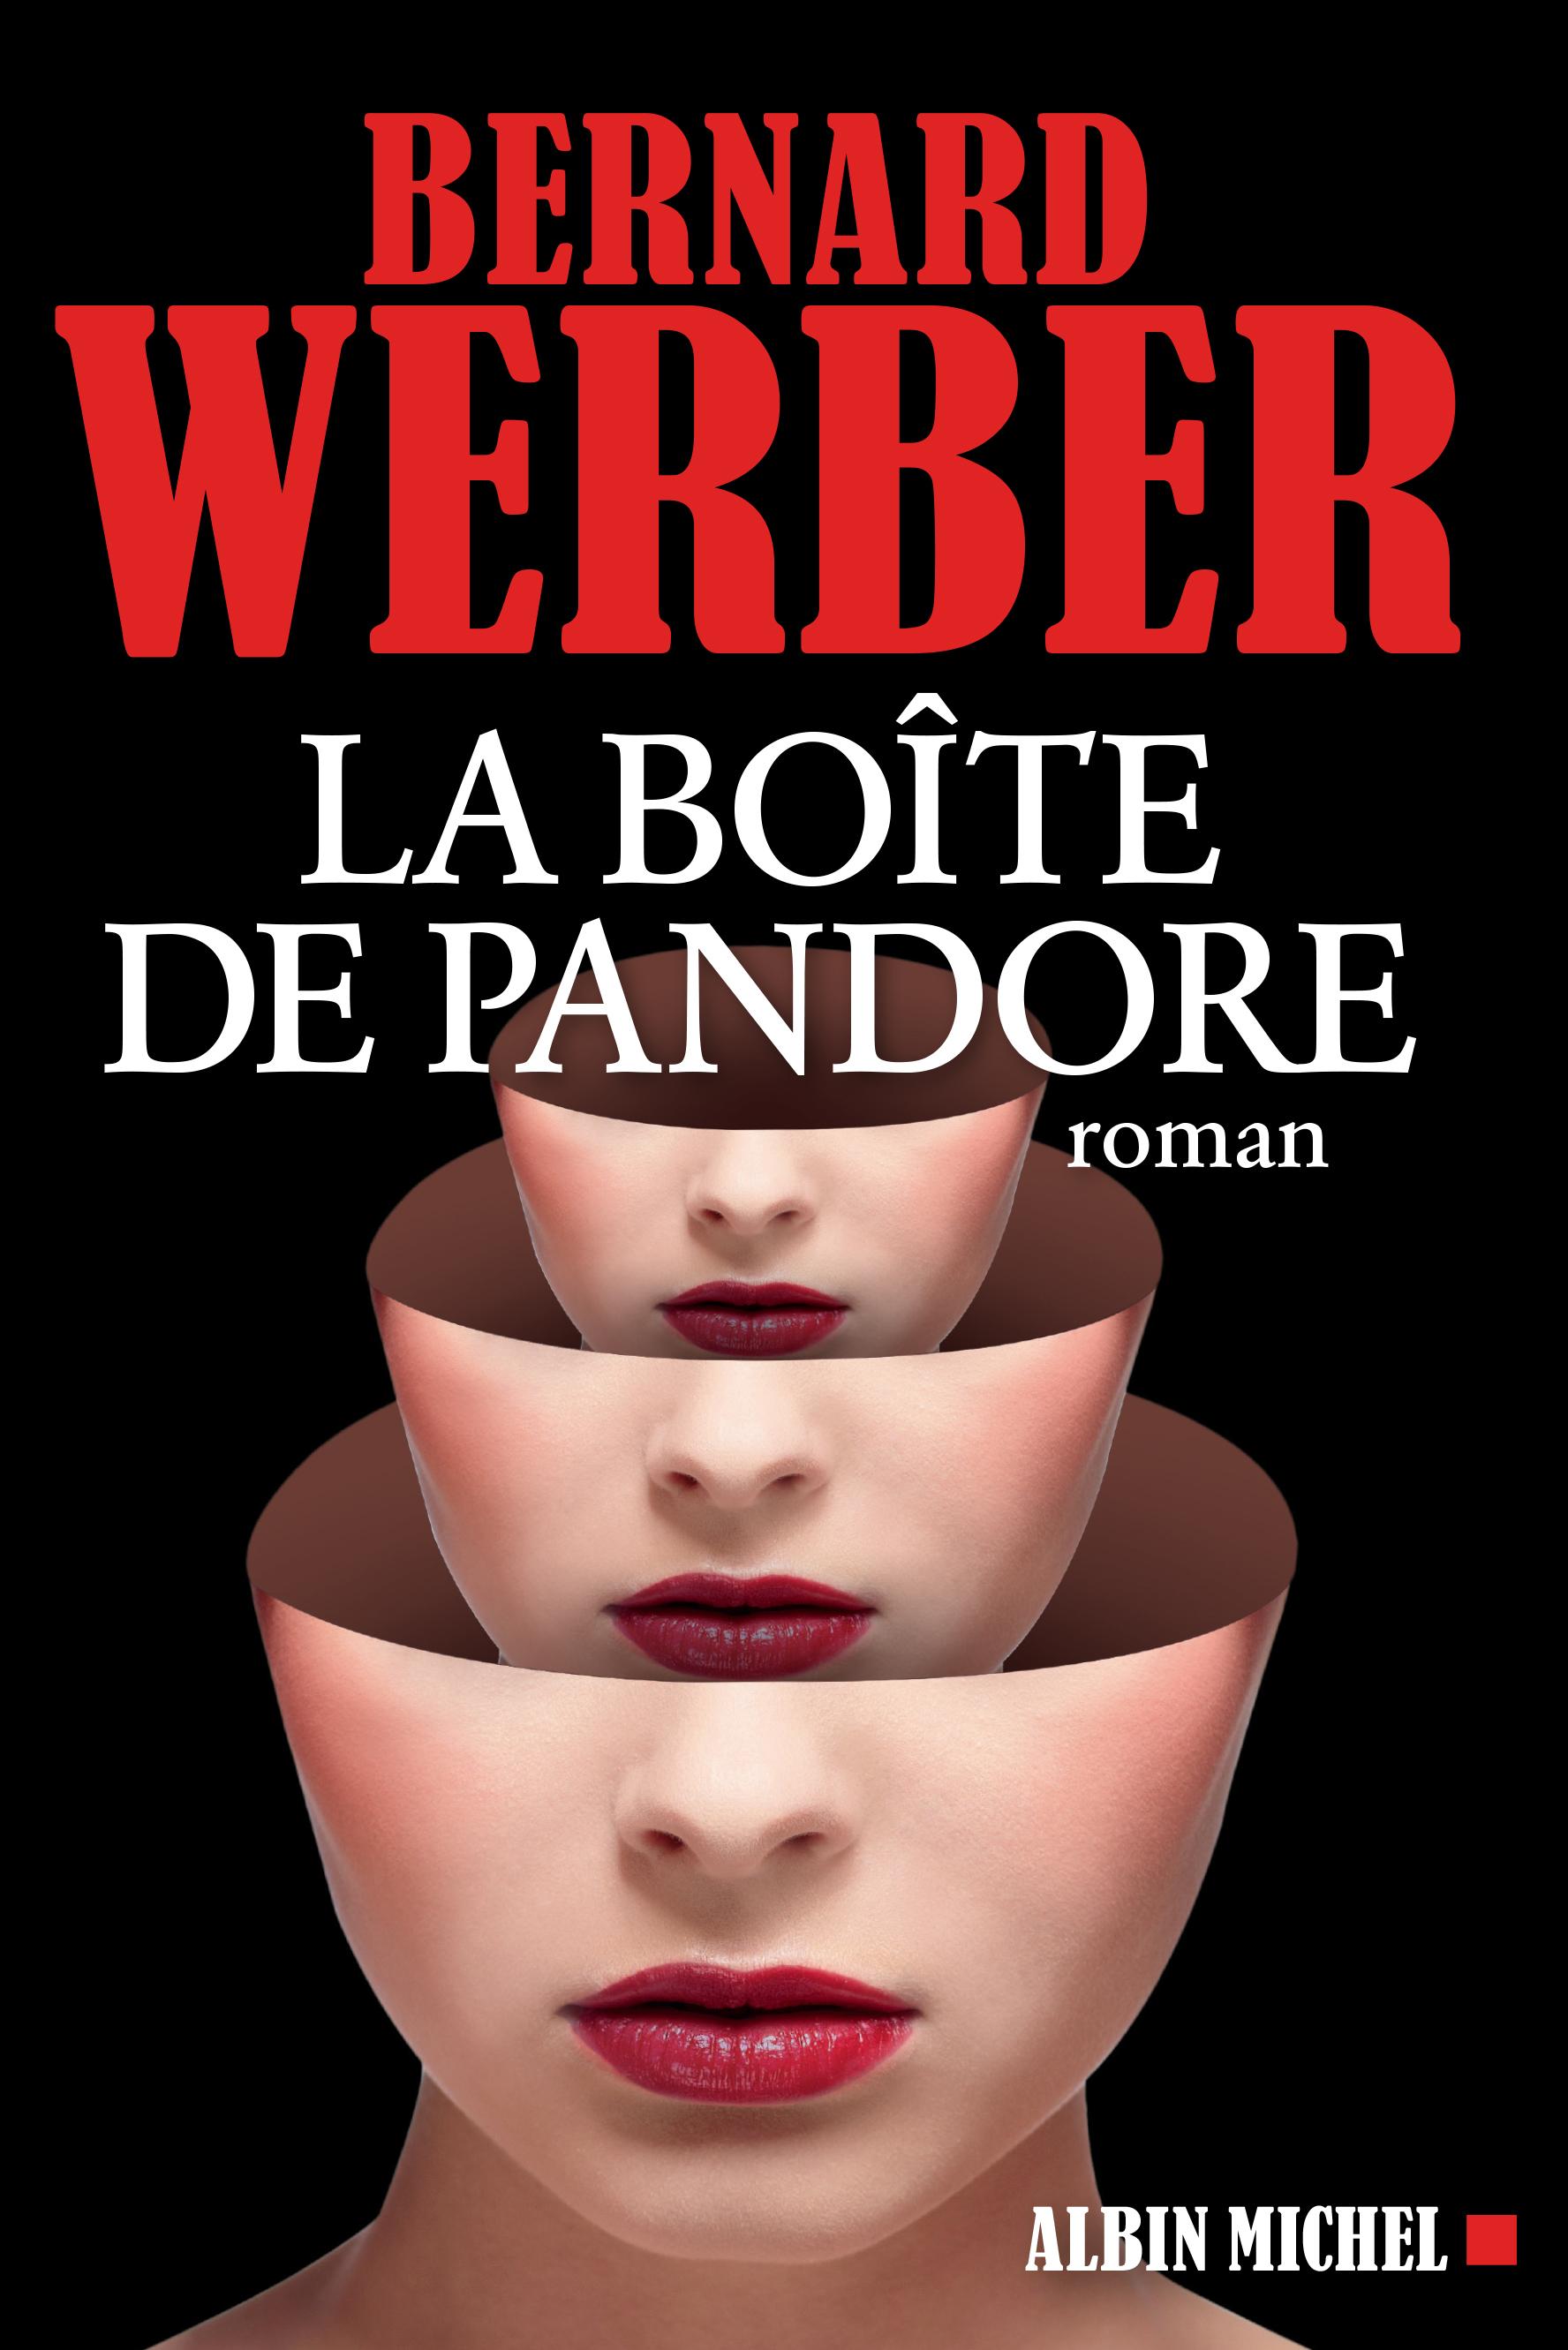 la-boc3aete-de-pandore-1